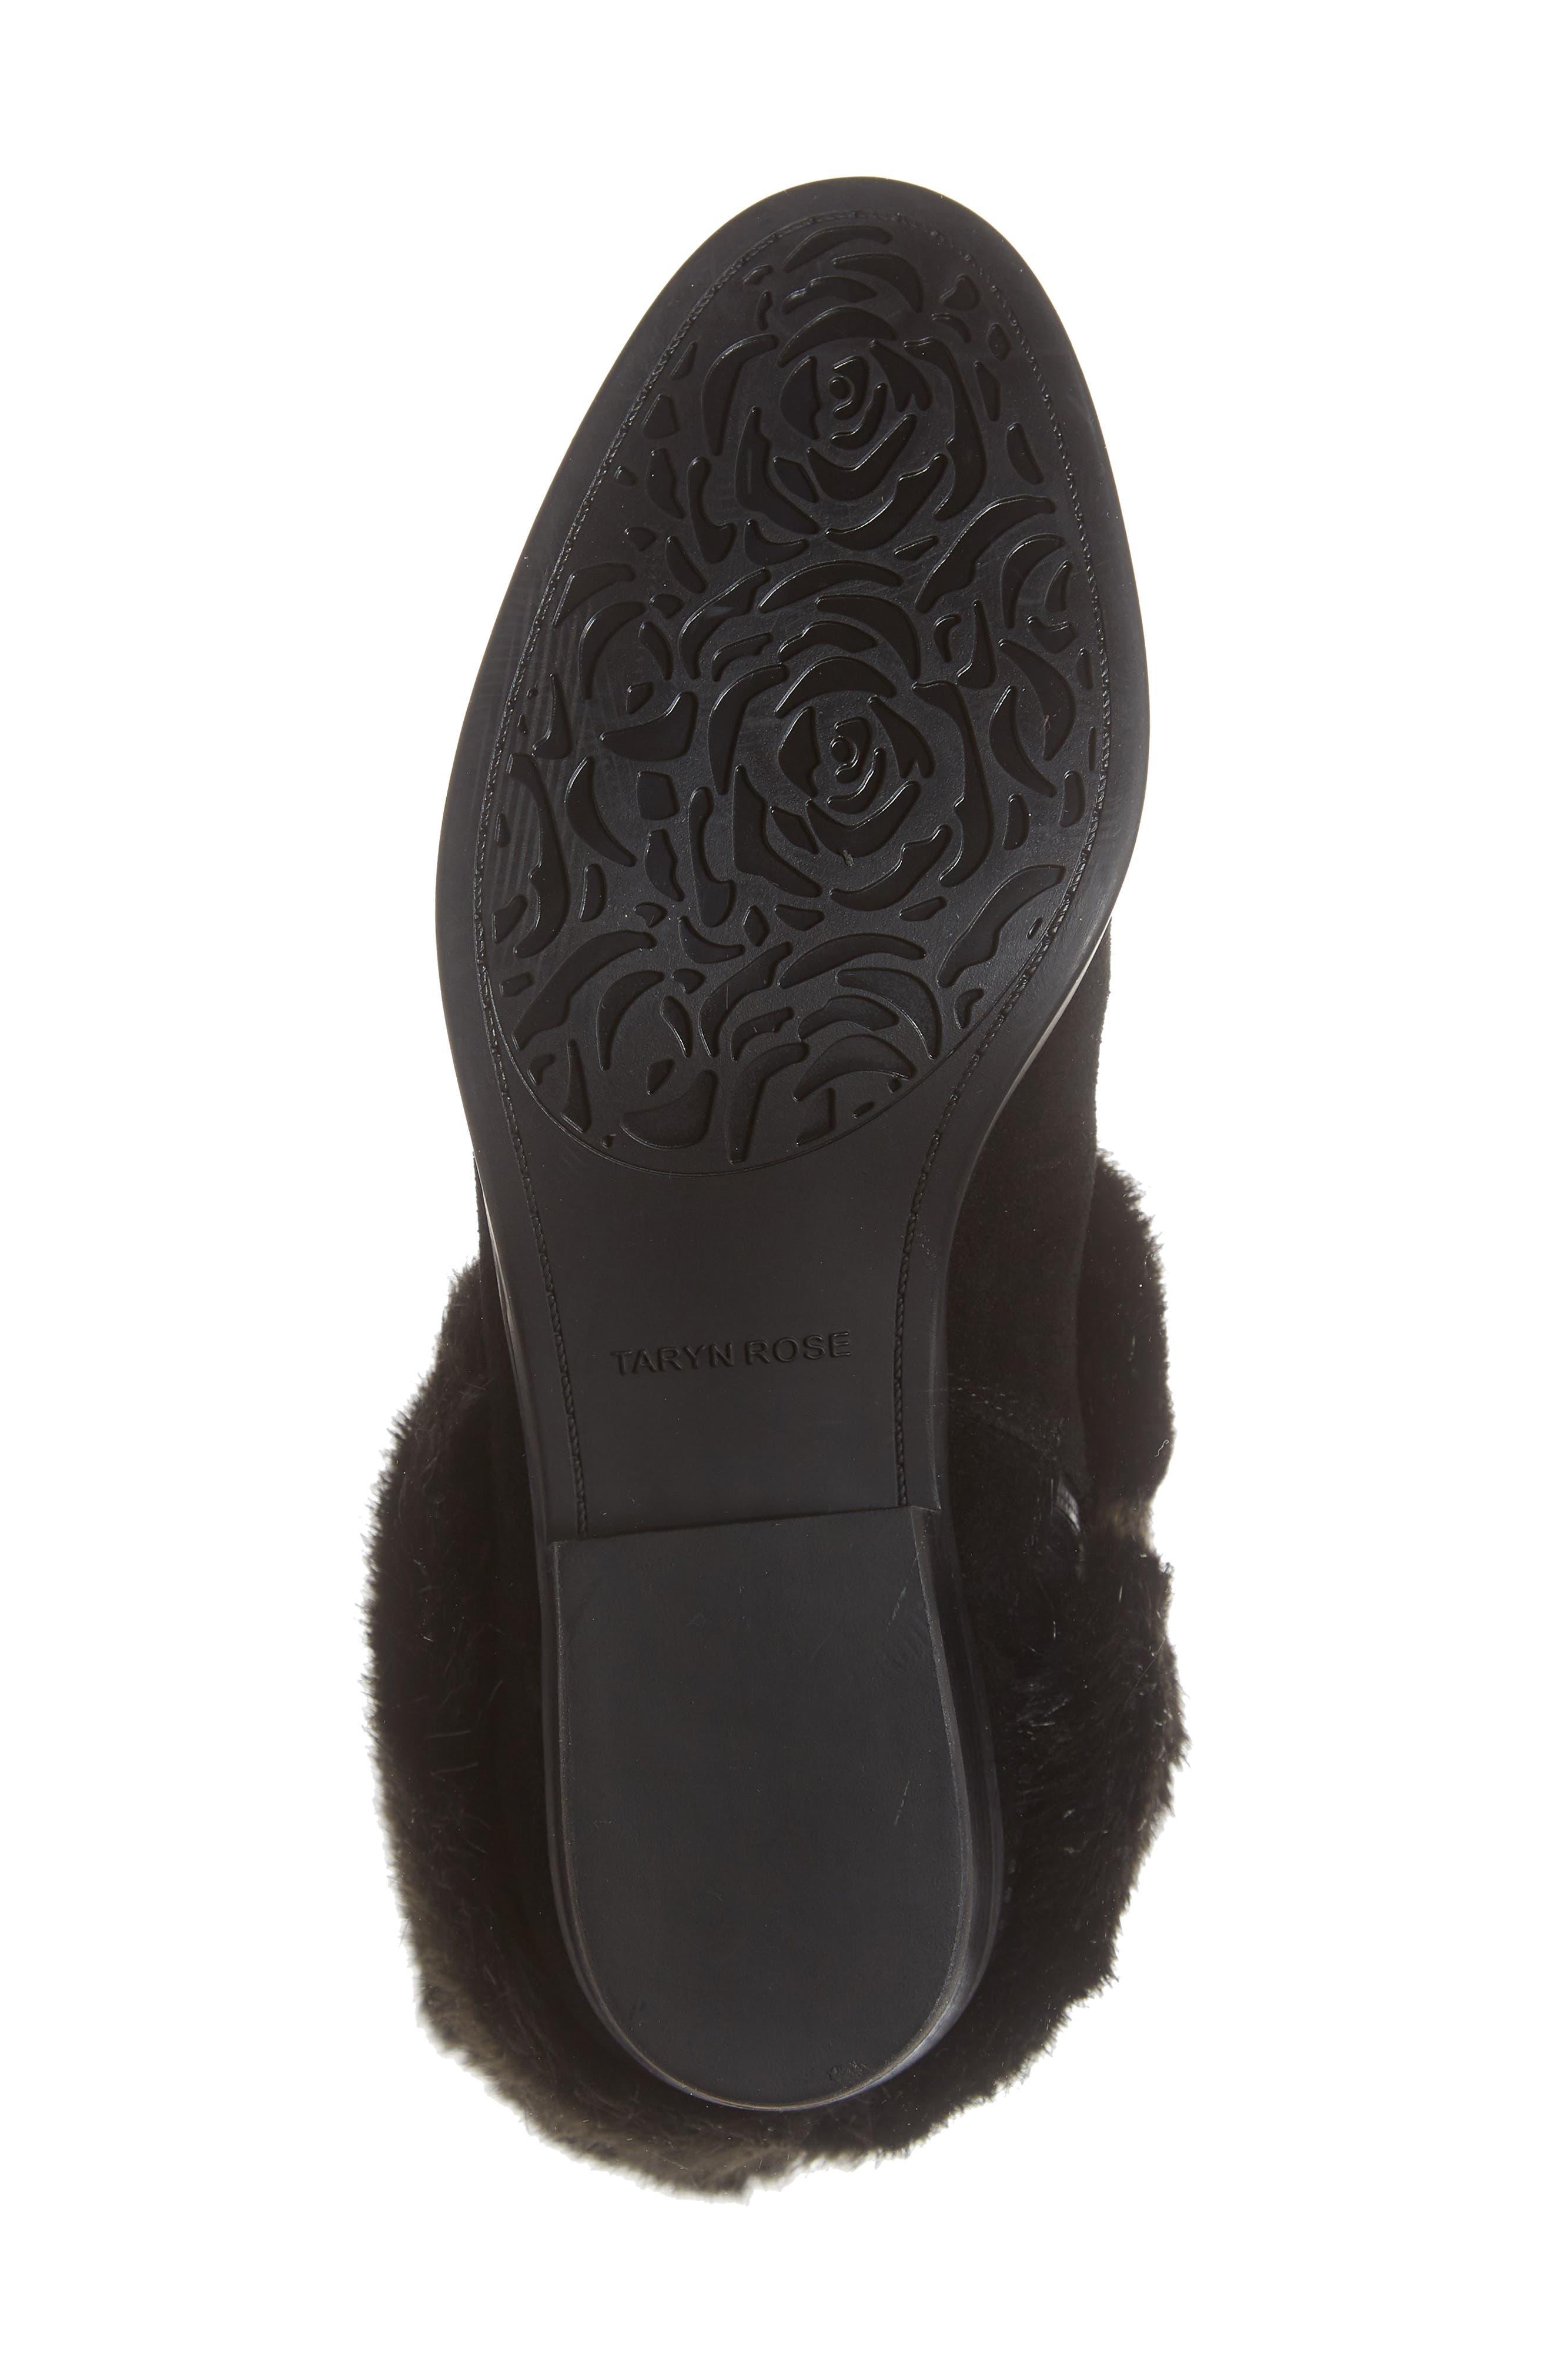 Giselle Water Resistant Faux Fur Boot,                             Alternate thumbnail 6, color,                             BLACK SUEDE